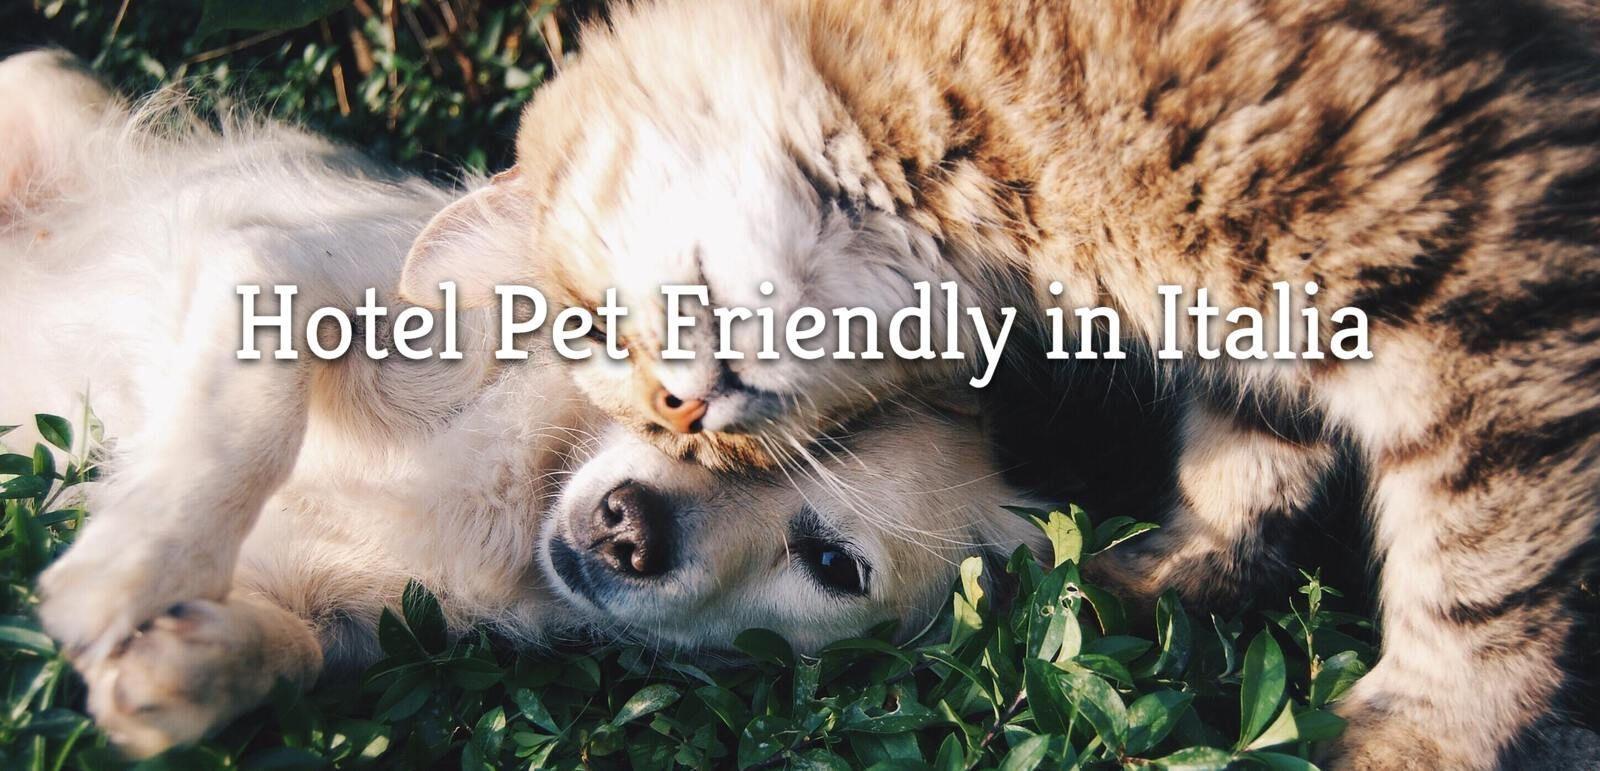 Hotel Pet Friendly Italia